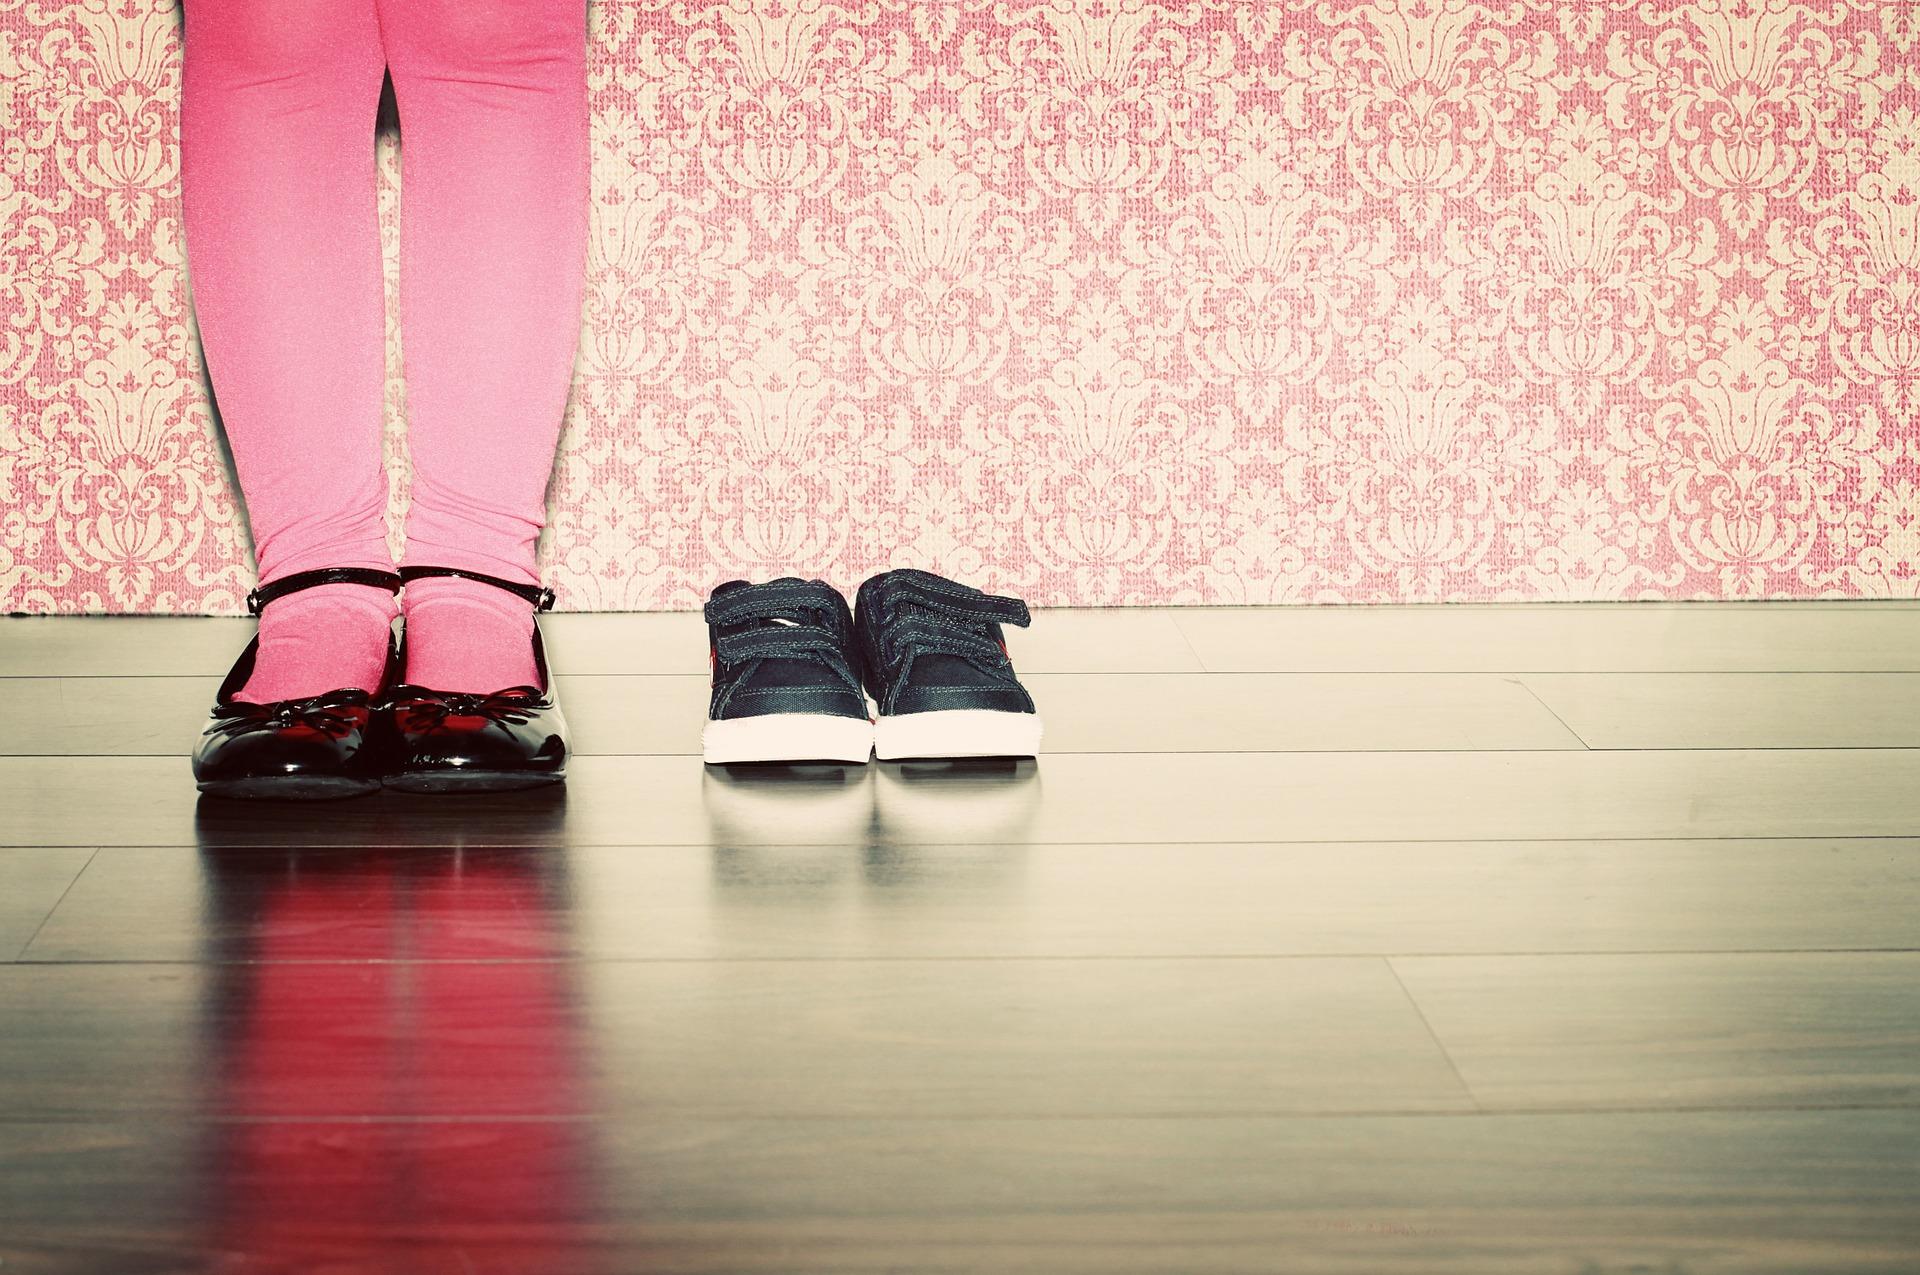 shoes-619526_1920.jpg